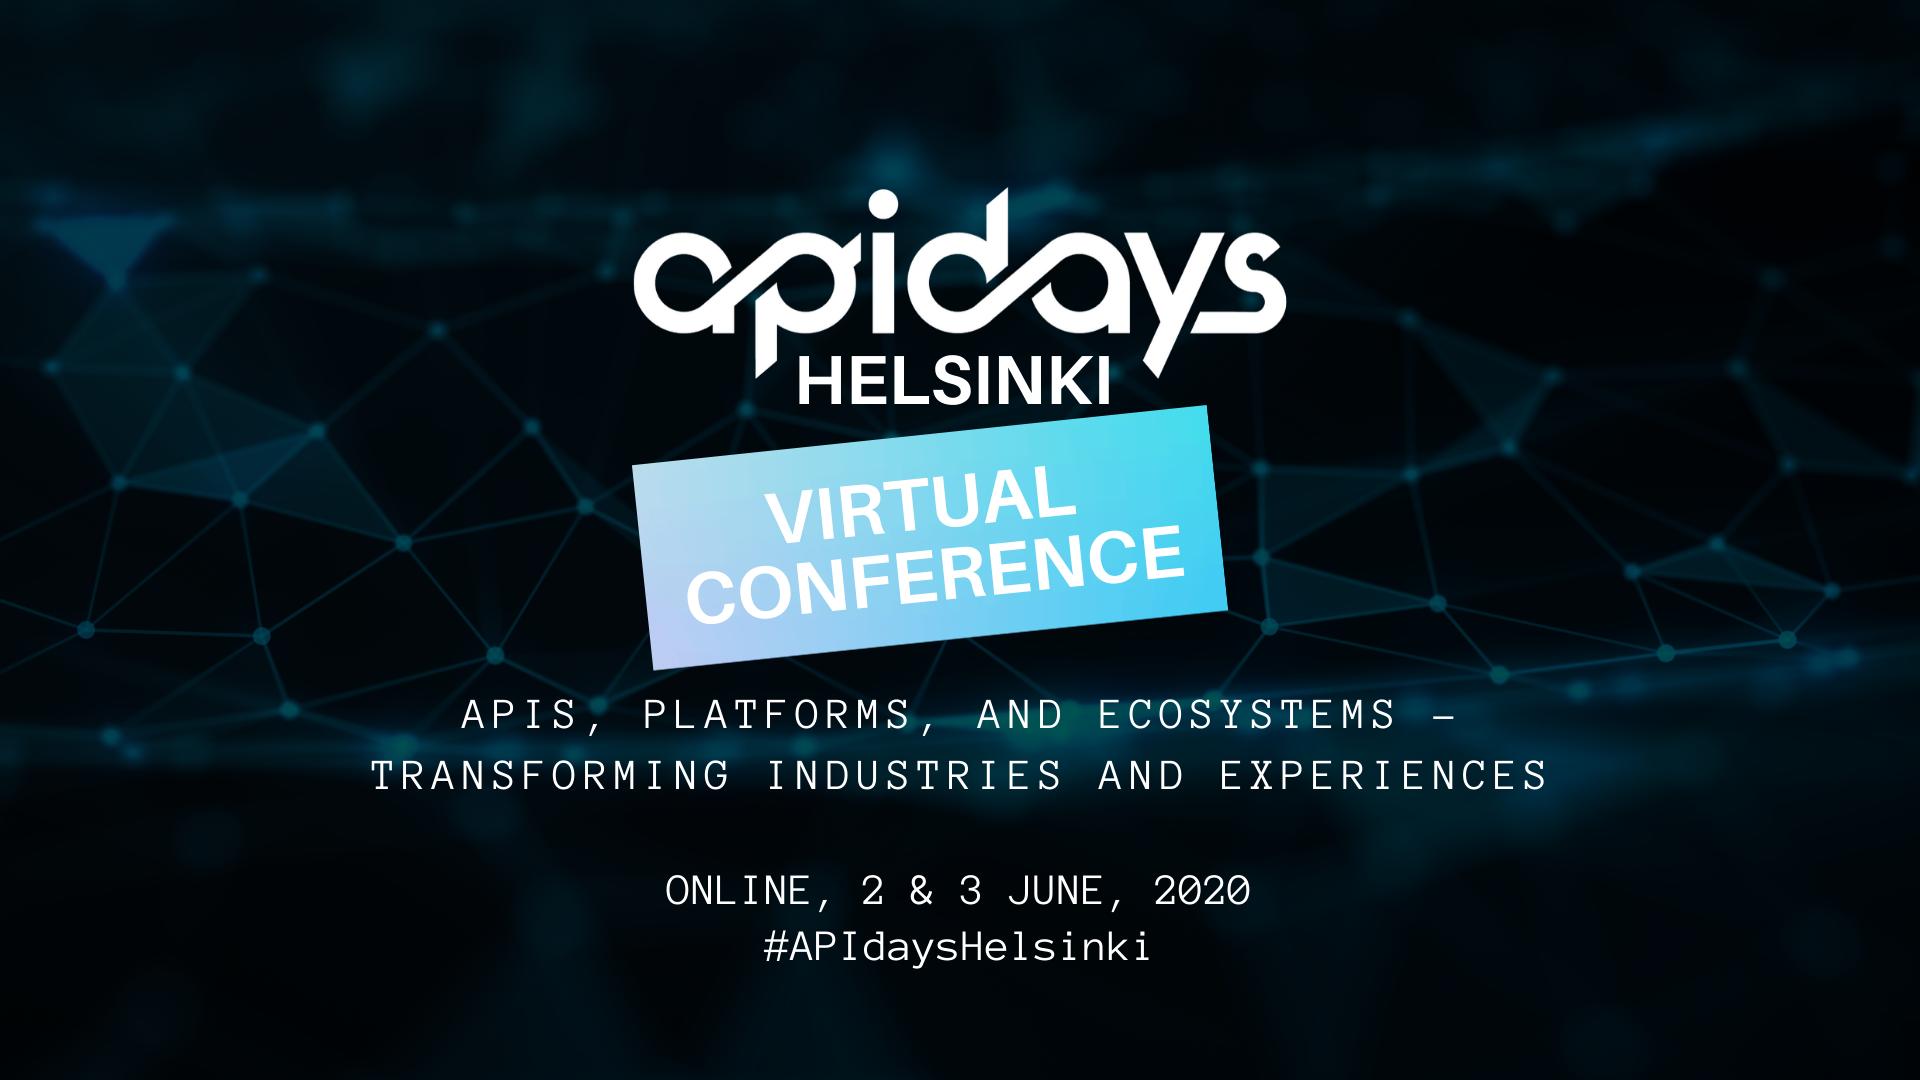 Virtuap APIdays Helsinki, June 2 & 3 2020